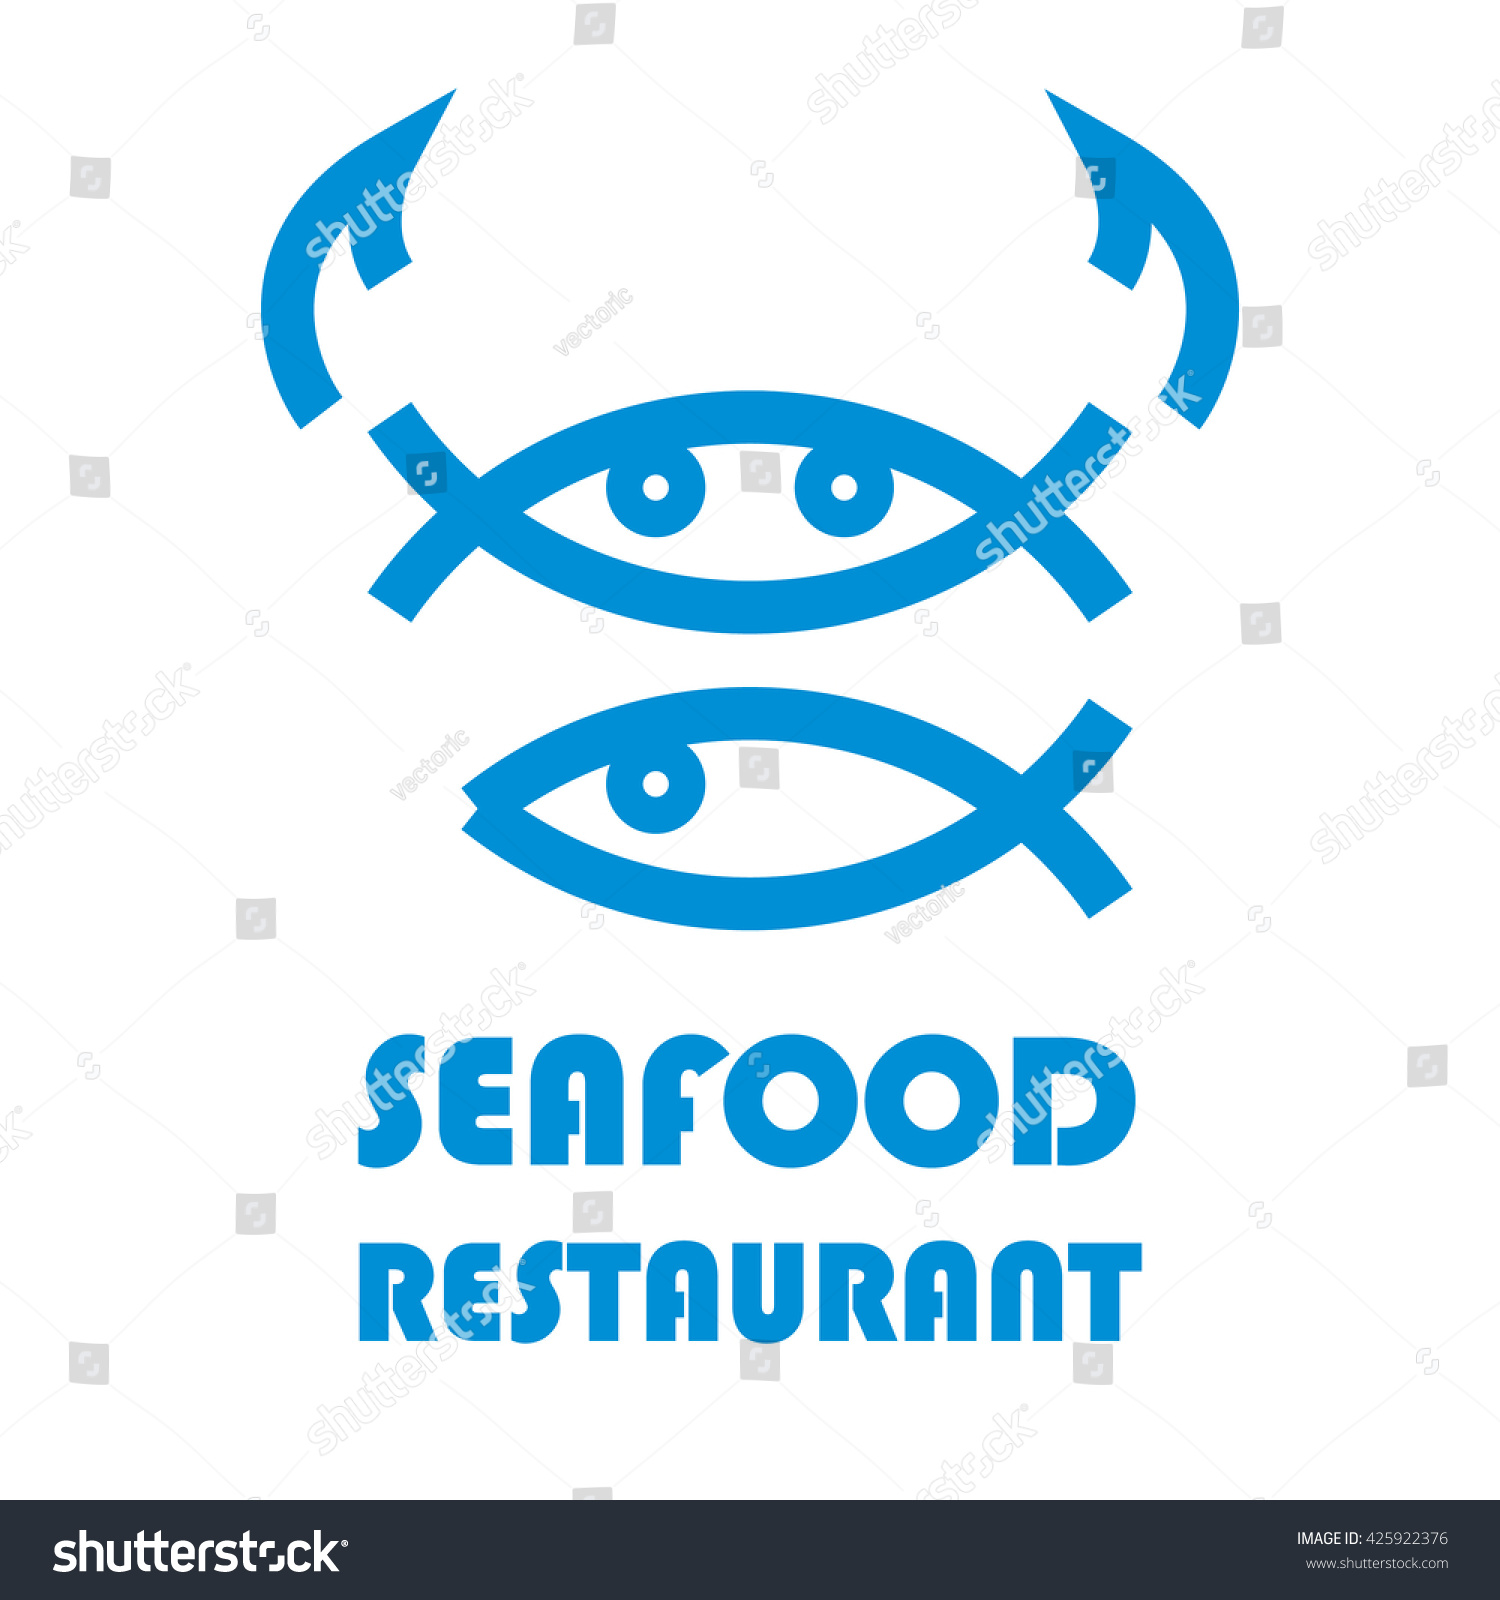 Seafood restaurant logo design stock vector illustration